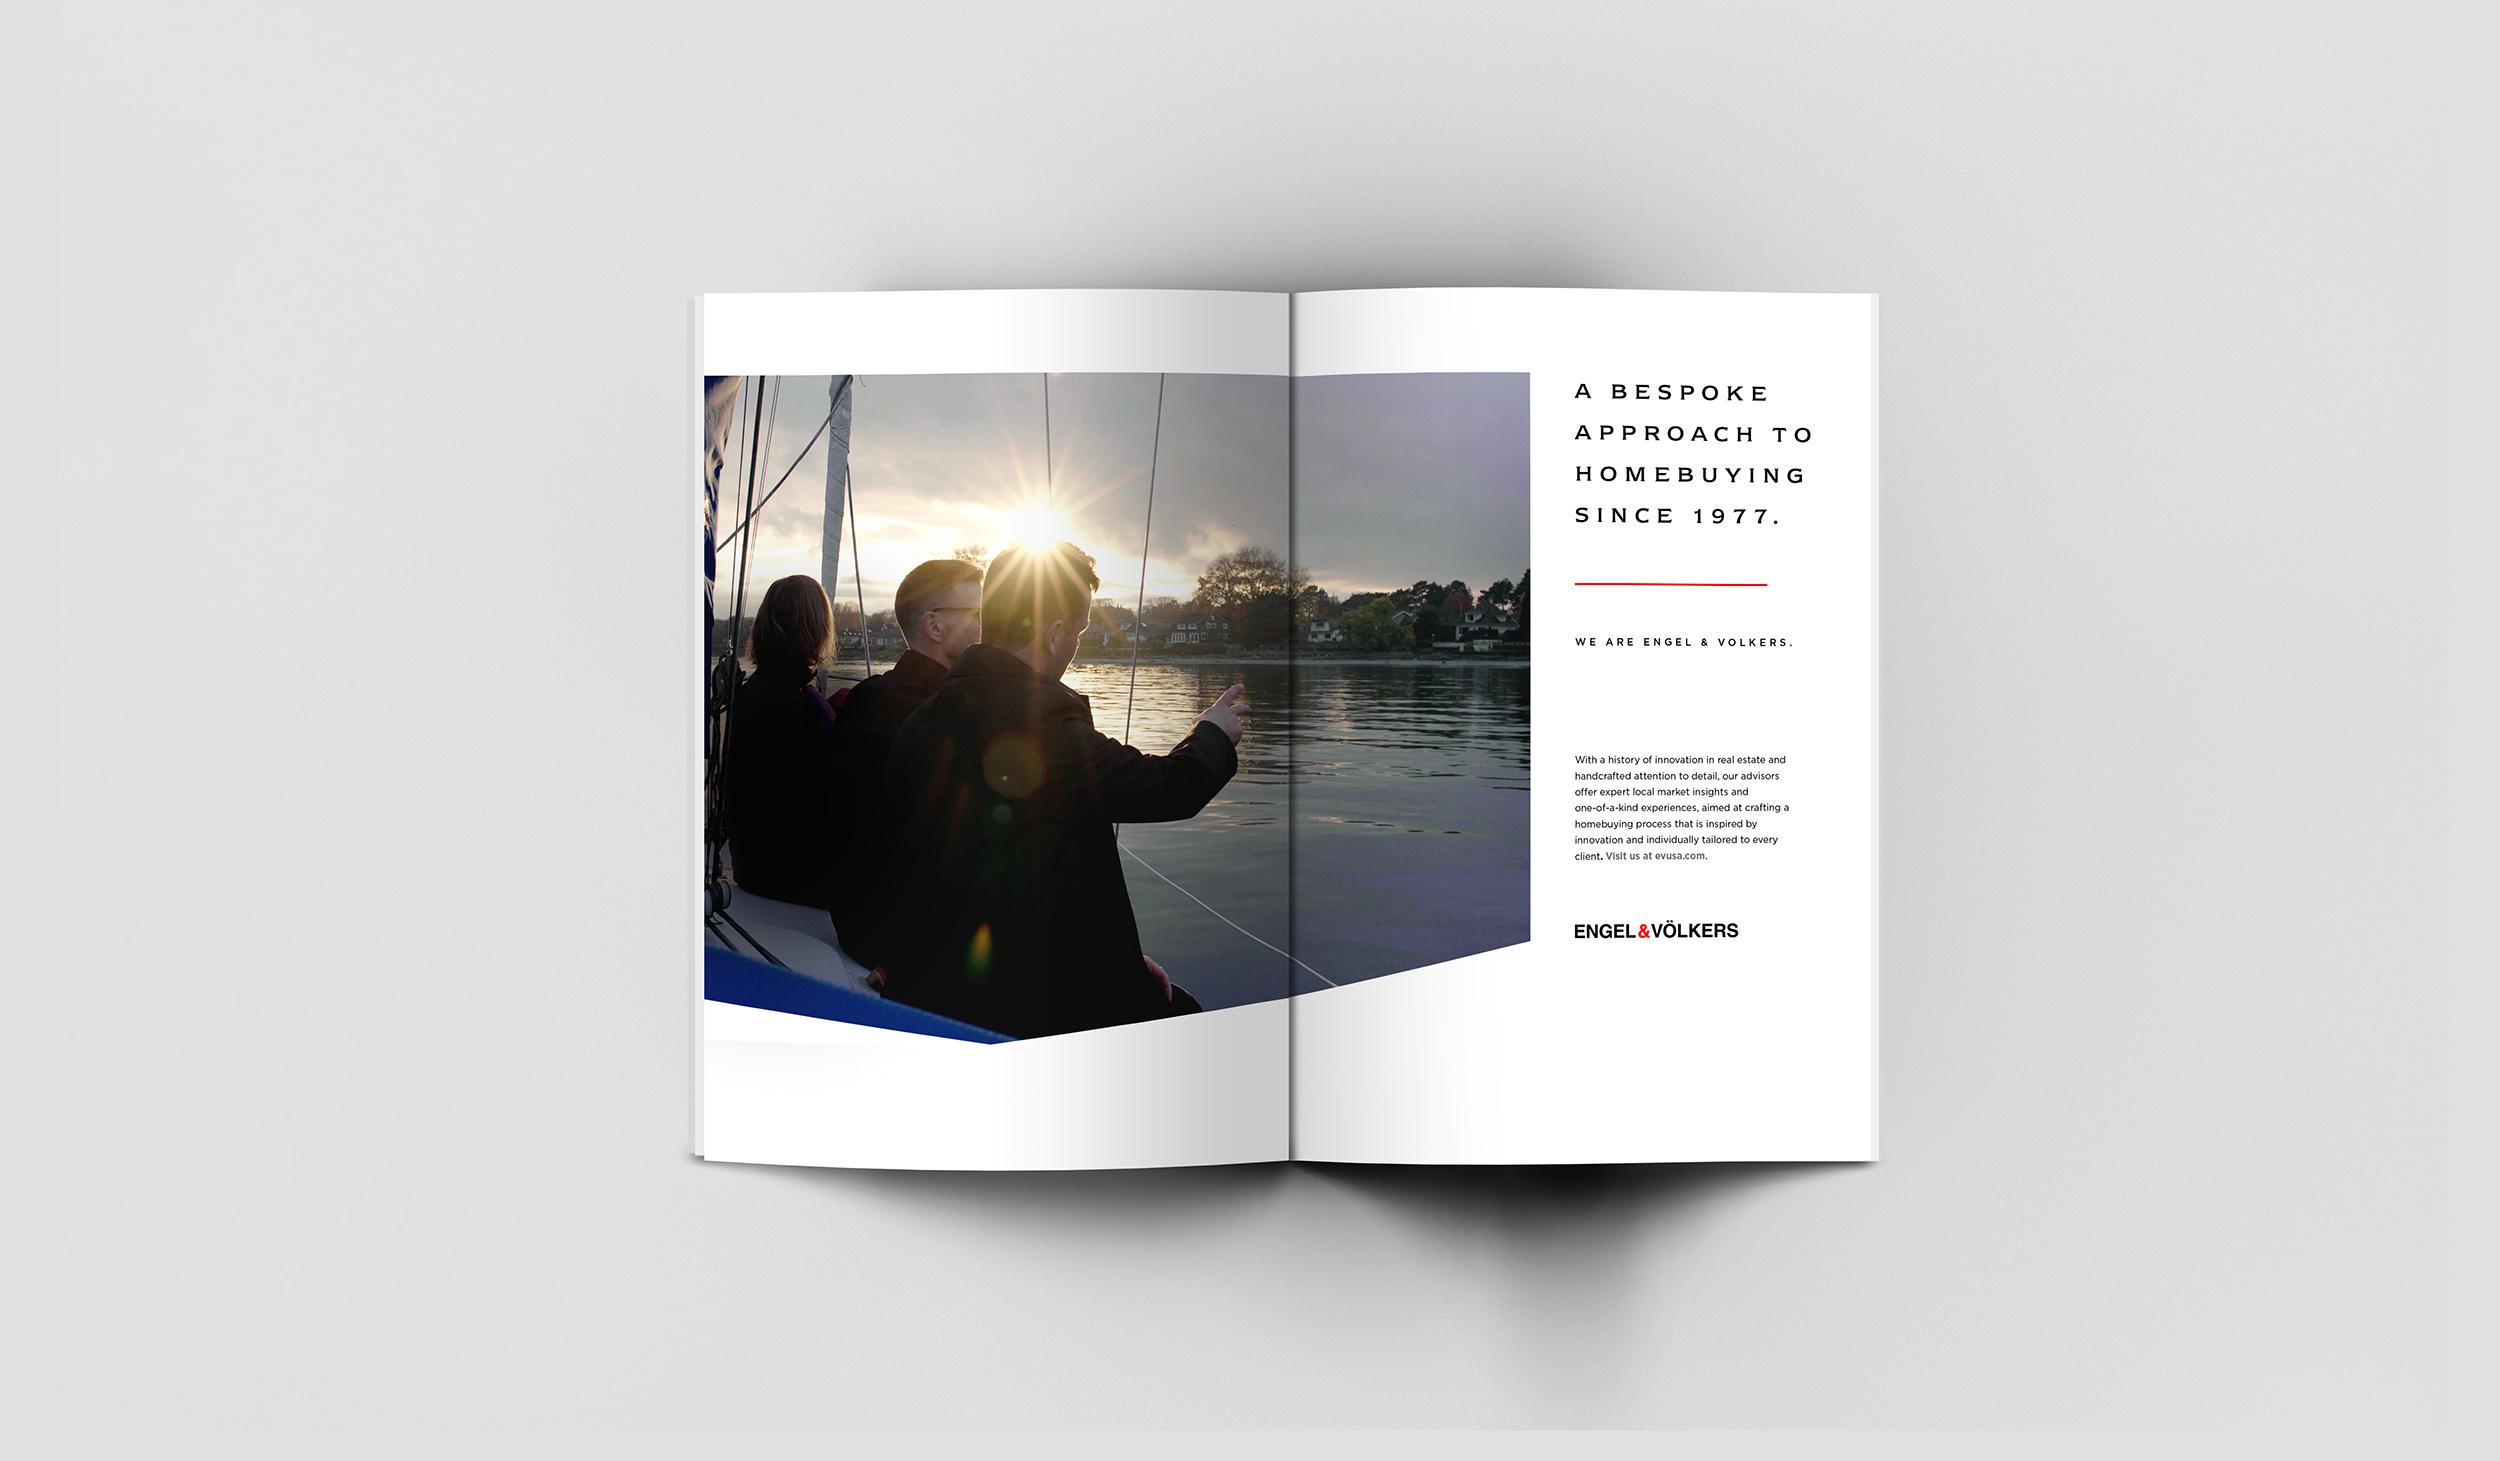 bespoke-approach-mockup-print.jpg